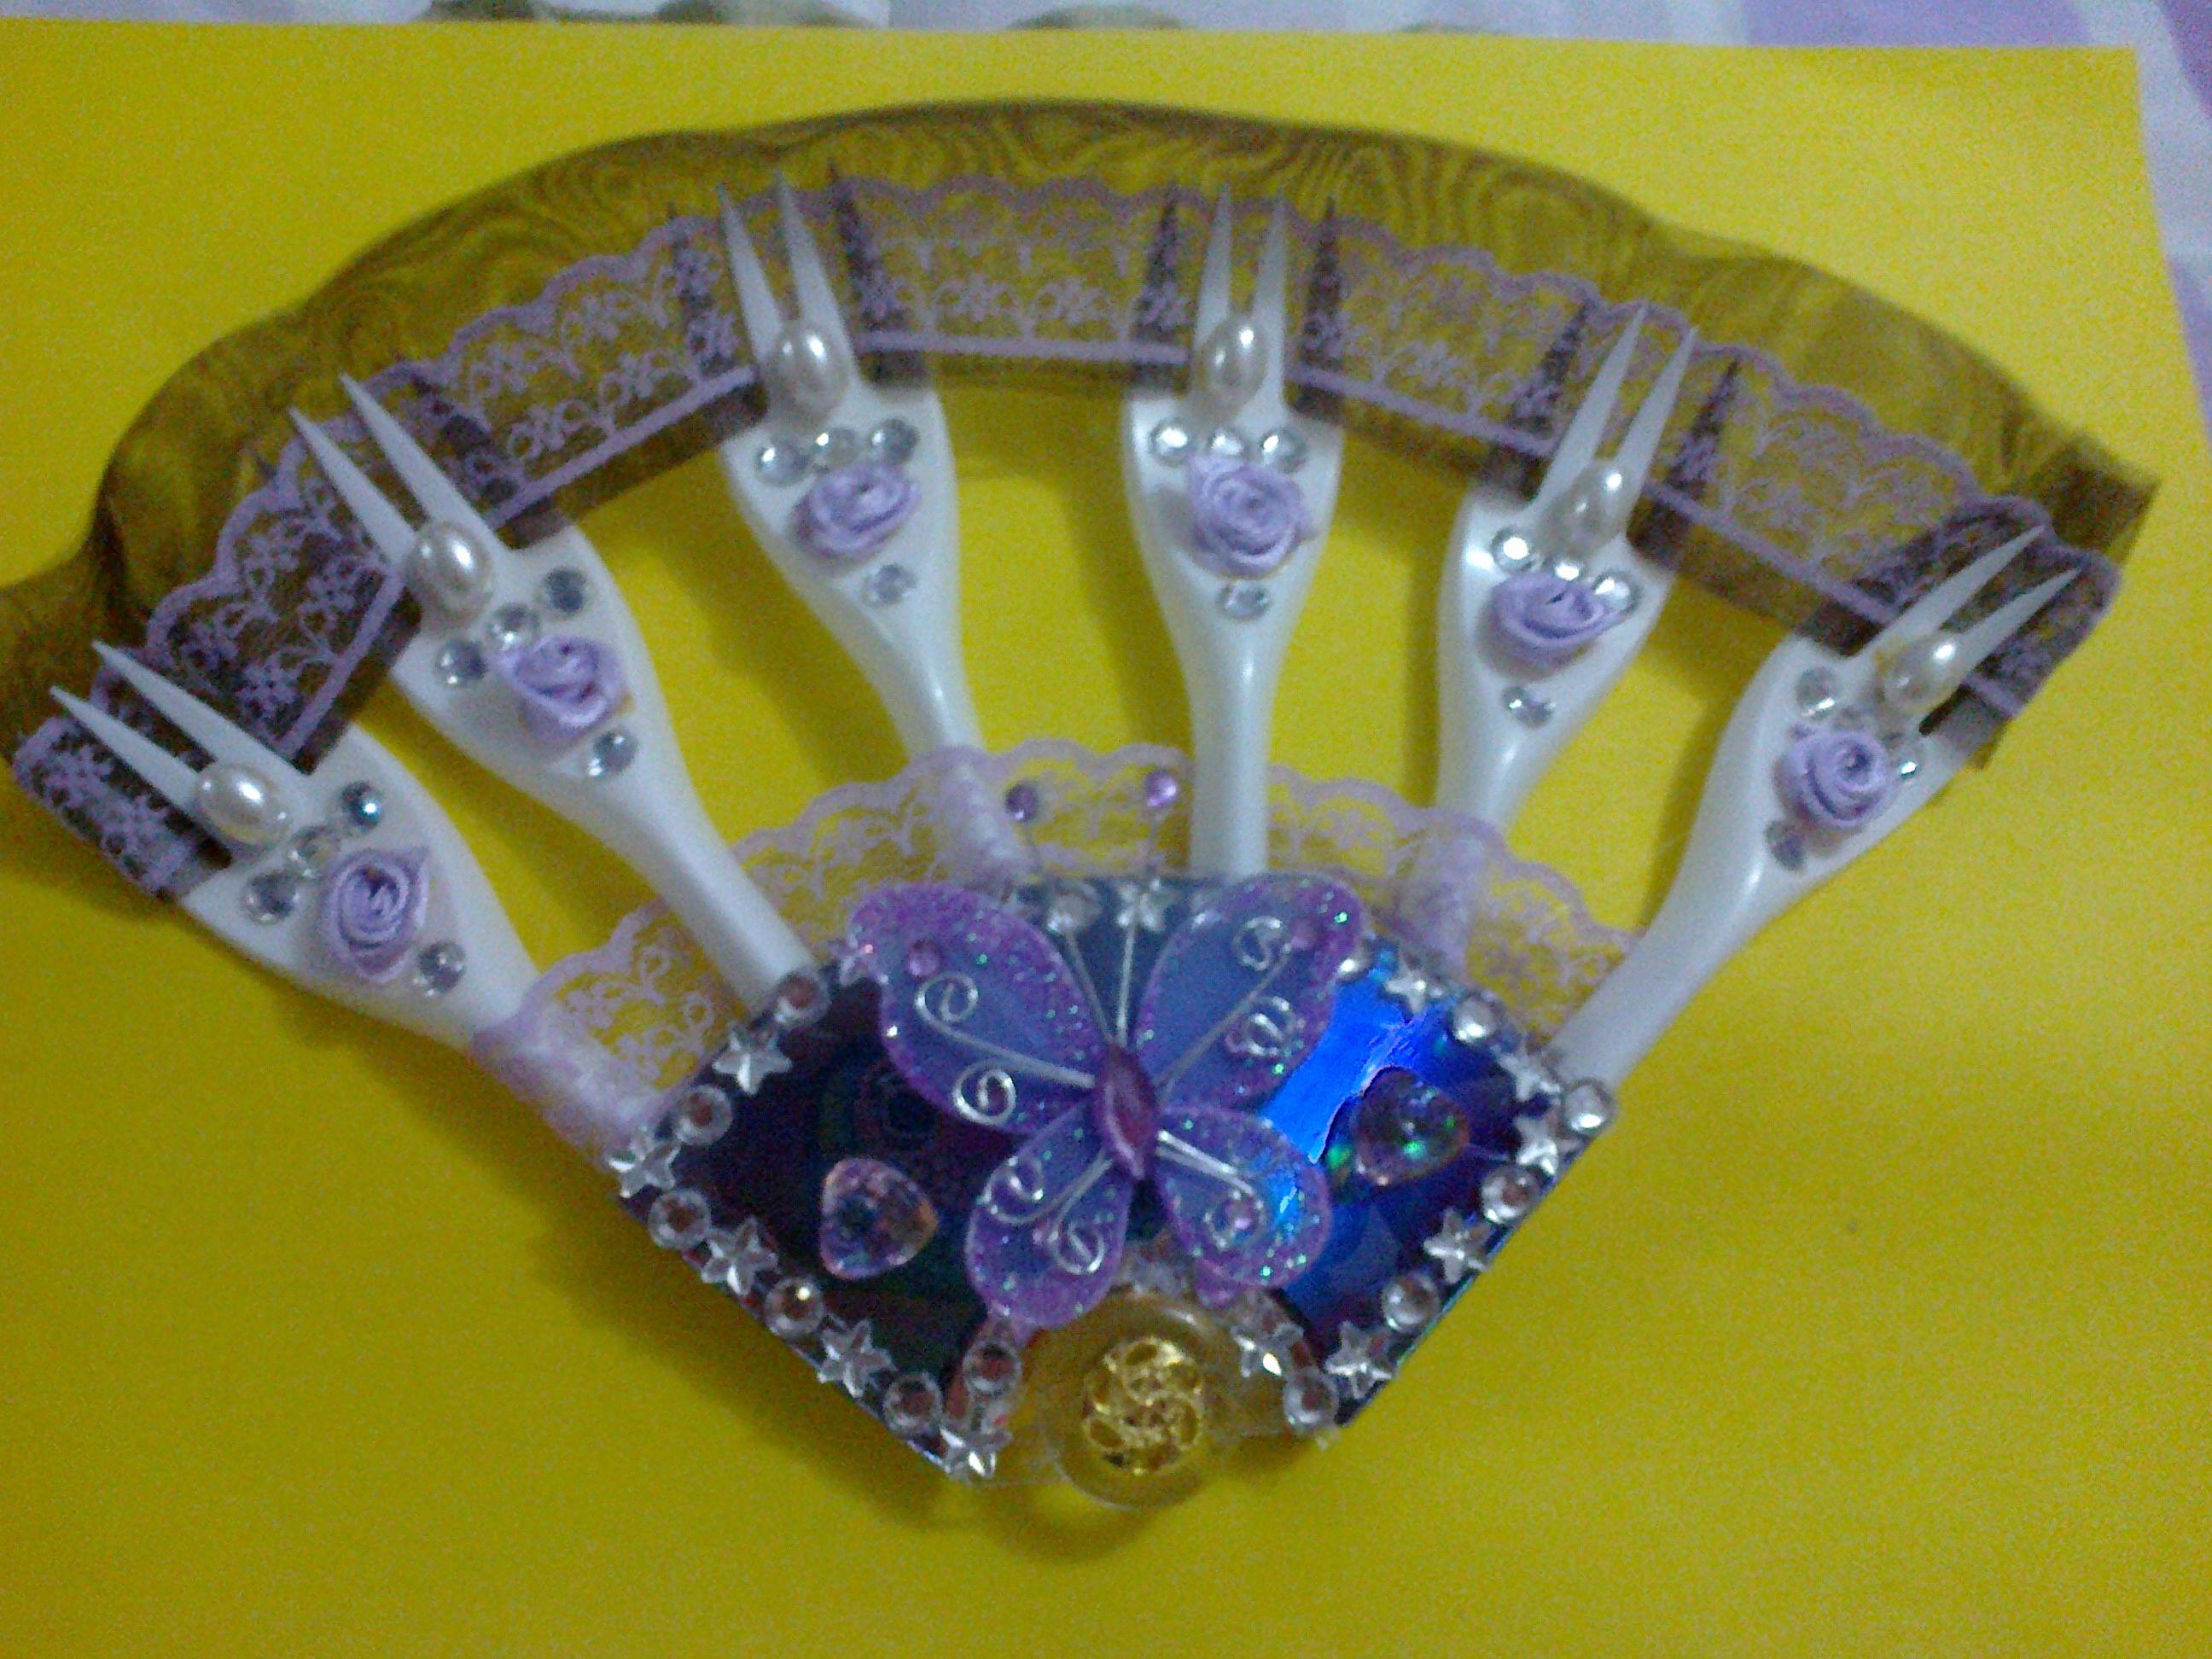 abanico con tenedores +cd+adornos